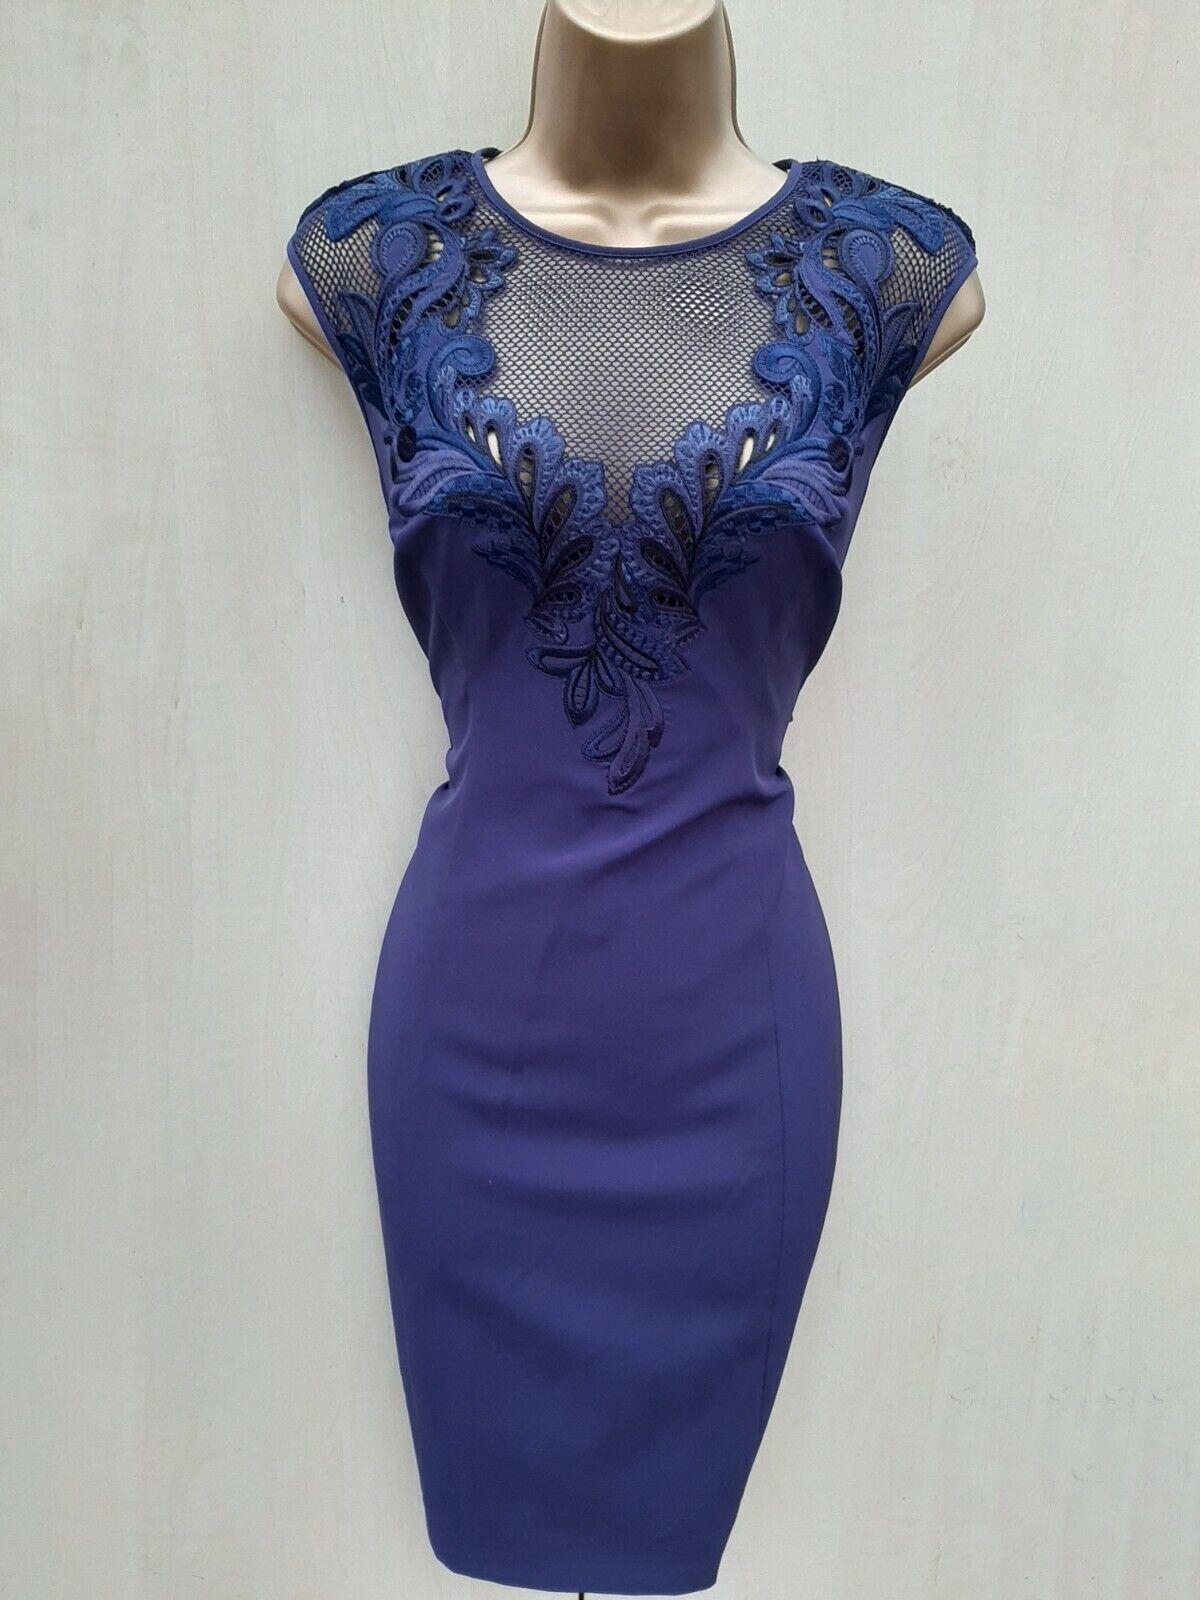 850317dec618a9 Größe 12 UK KAREN MILLEN Lace Embroiderot Pencil Dress Party Wedding Races  Navy akfvyv824-Kleider